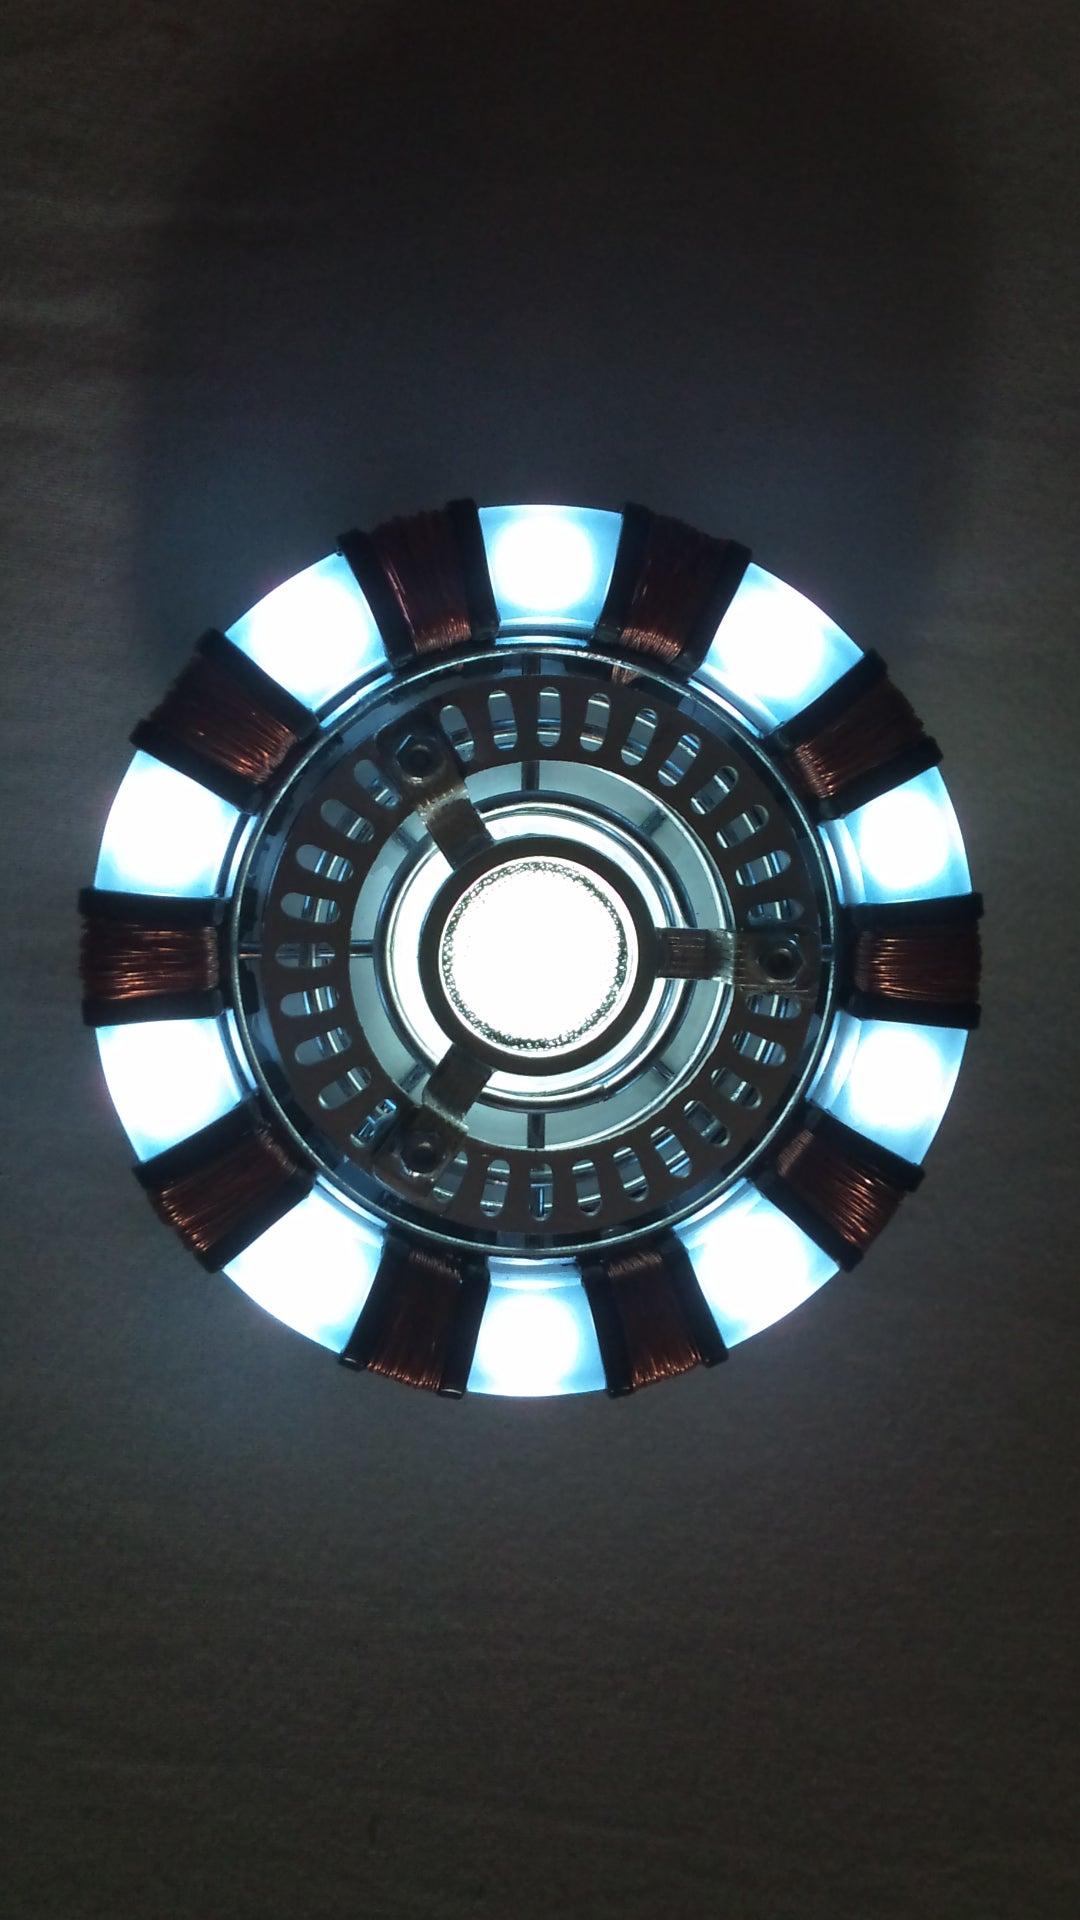 Tony Stark Arc Reactor Related Keywords & Suggestions - Tony Stark Arc ...